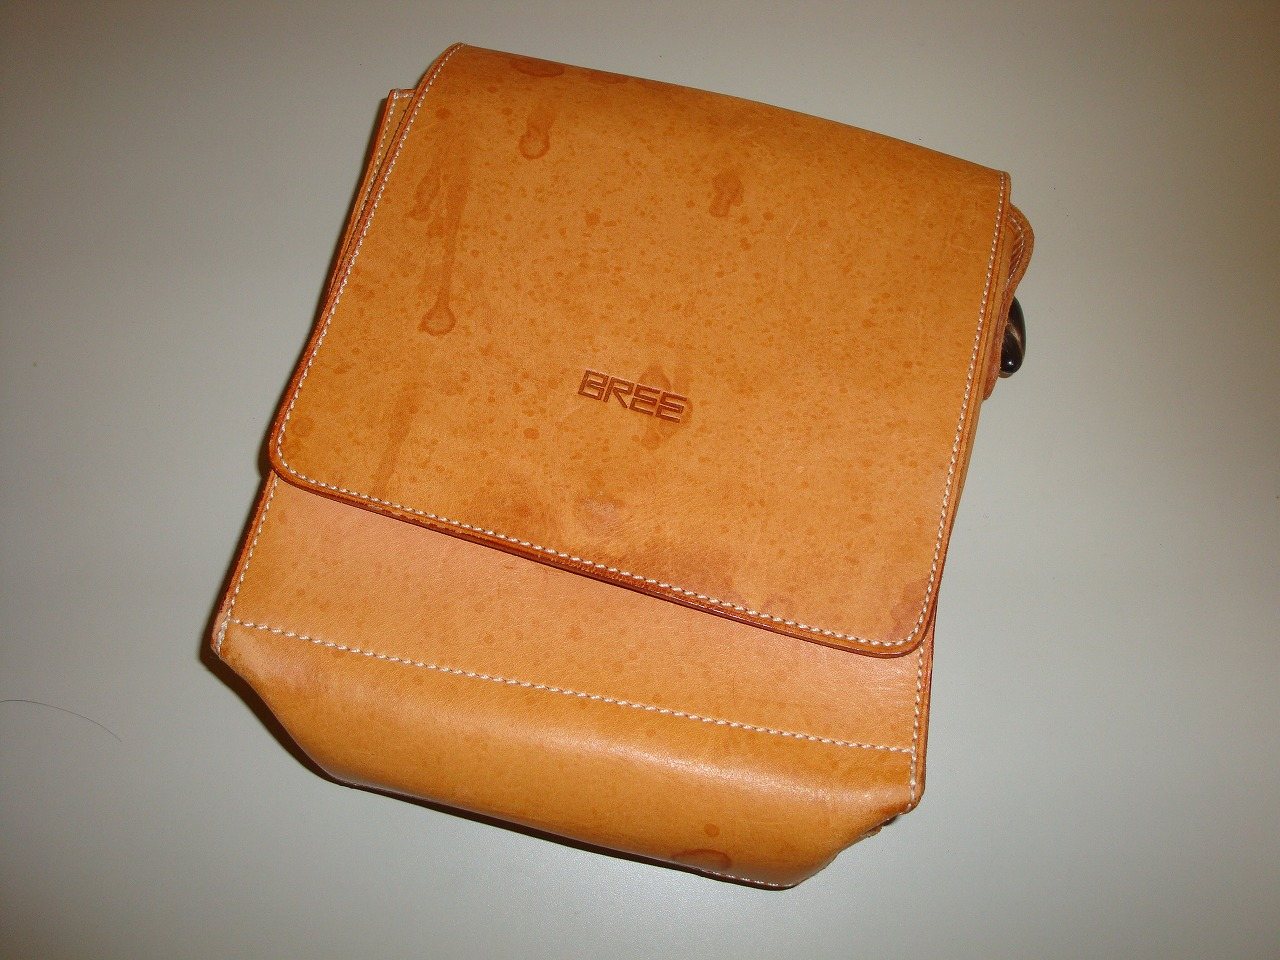 BREEのバッグに関わらずヌメ革系の製品は、見た目はとてもお洒落なのですが色落ちや雨染みになり